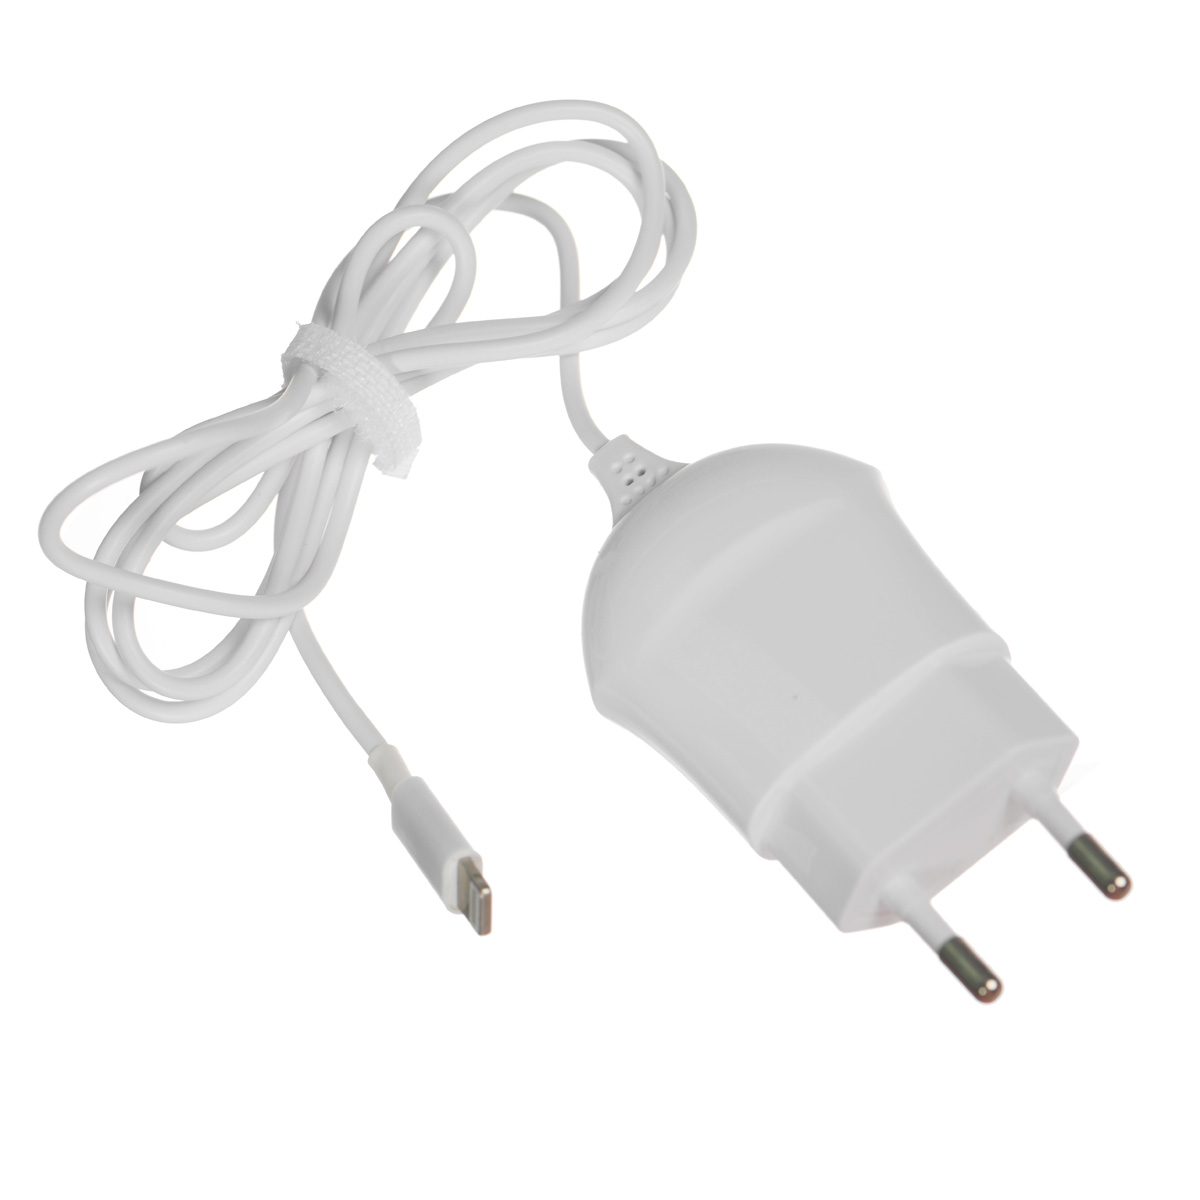 Deppa Wall Charger 1A, White сетевое зарядное устройство с разъемом 8-pin